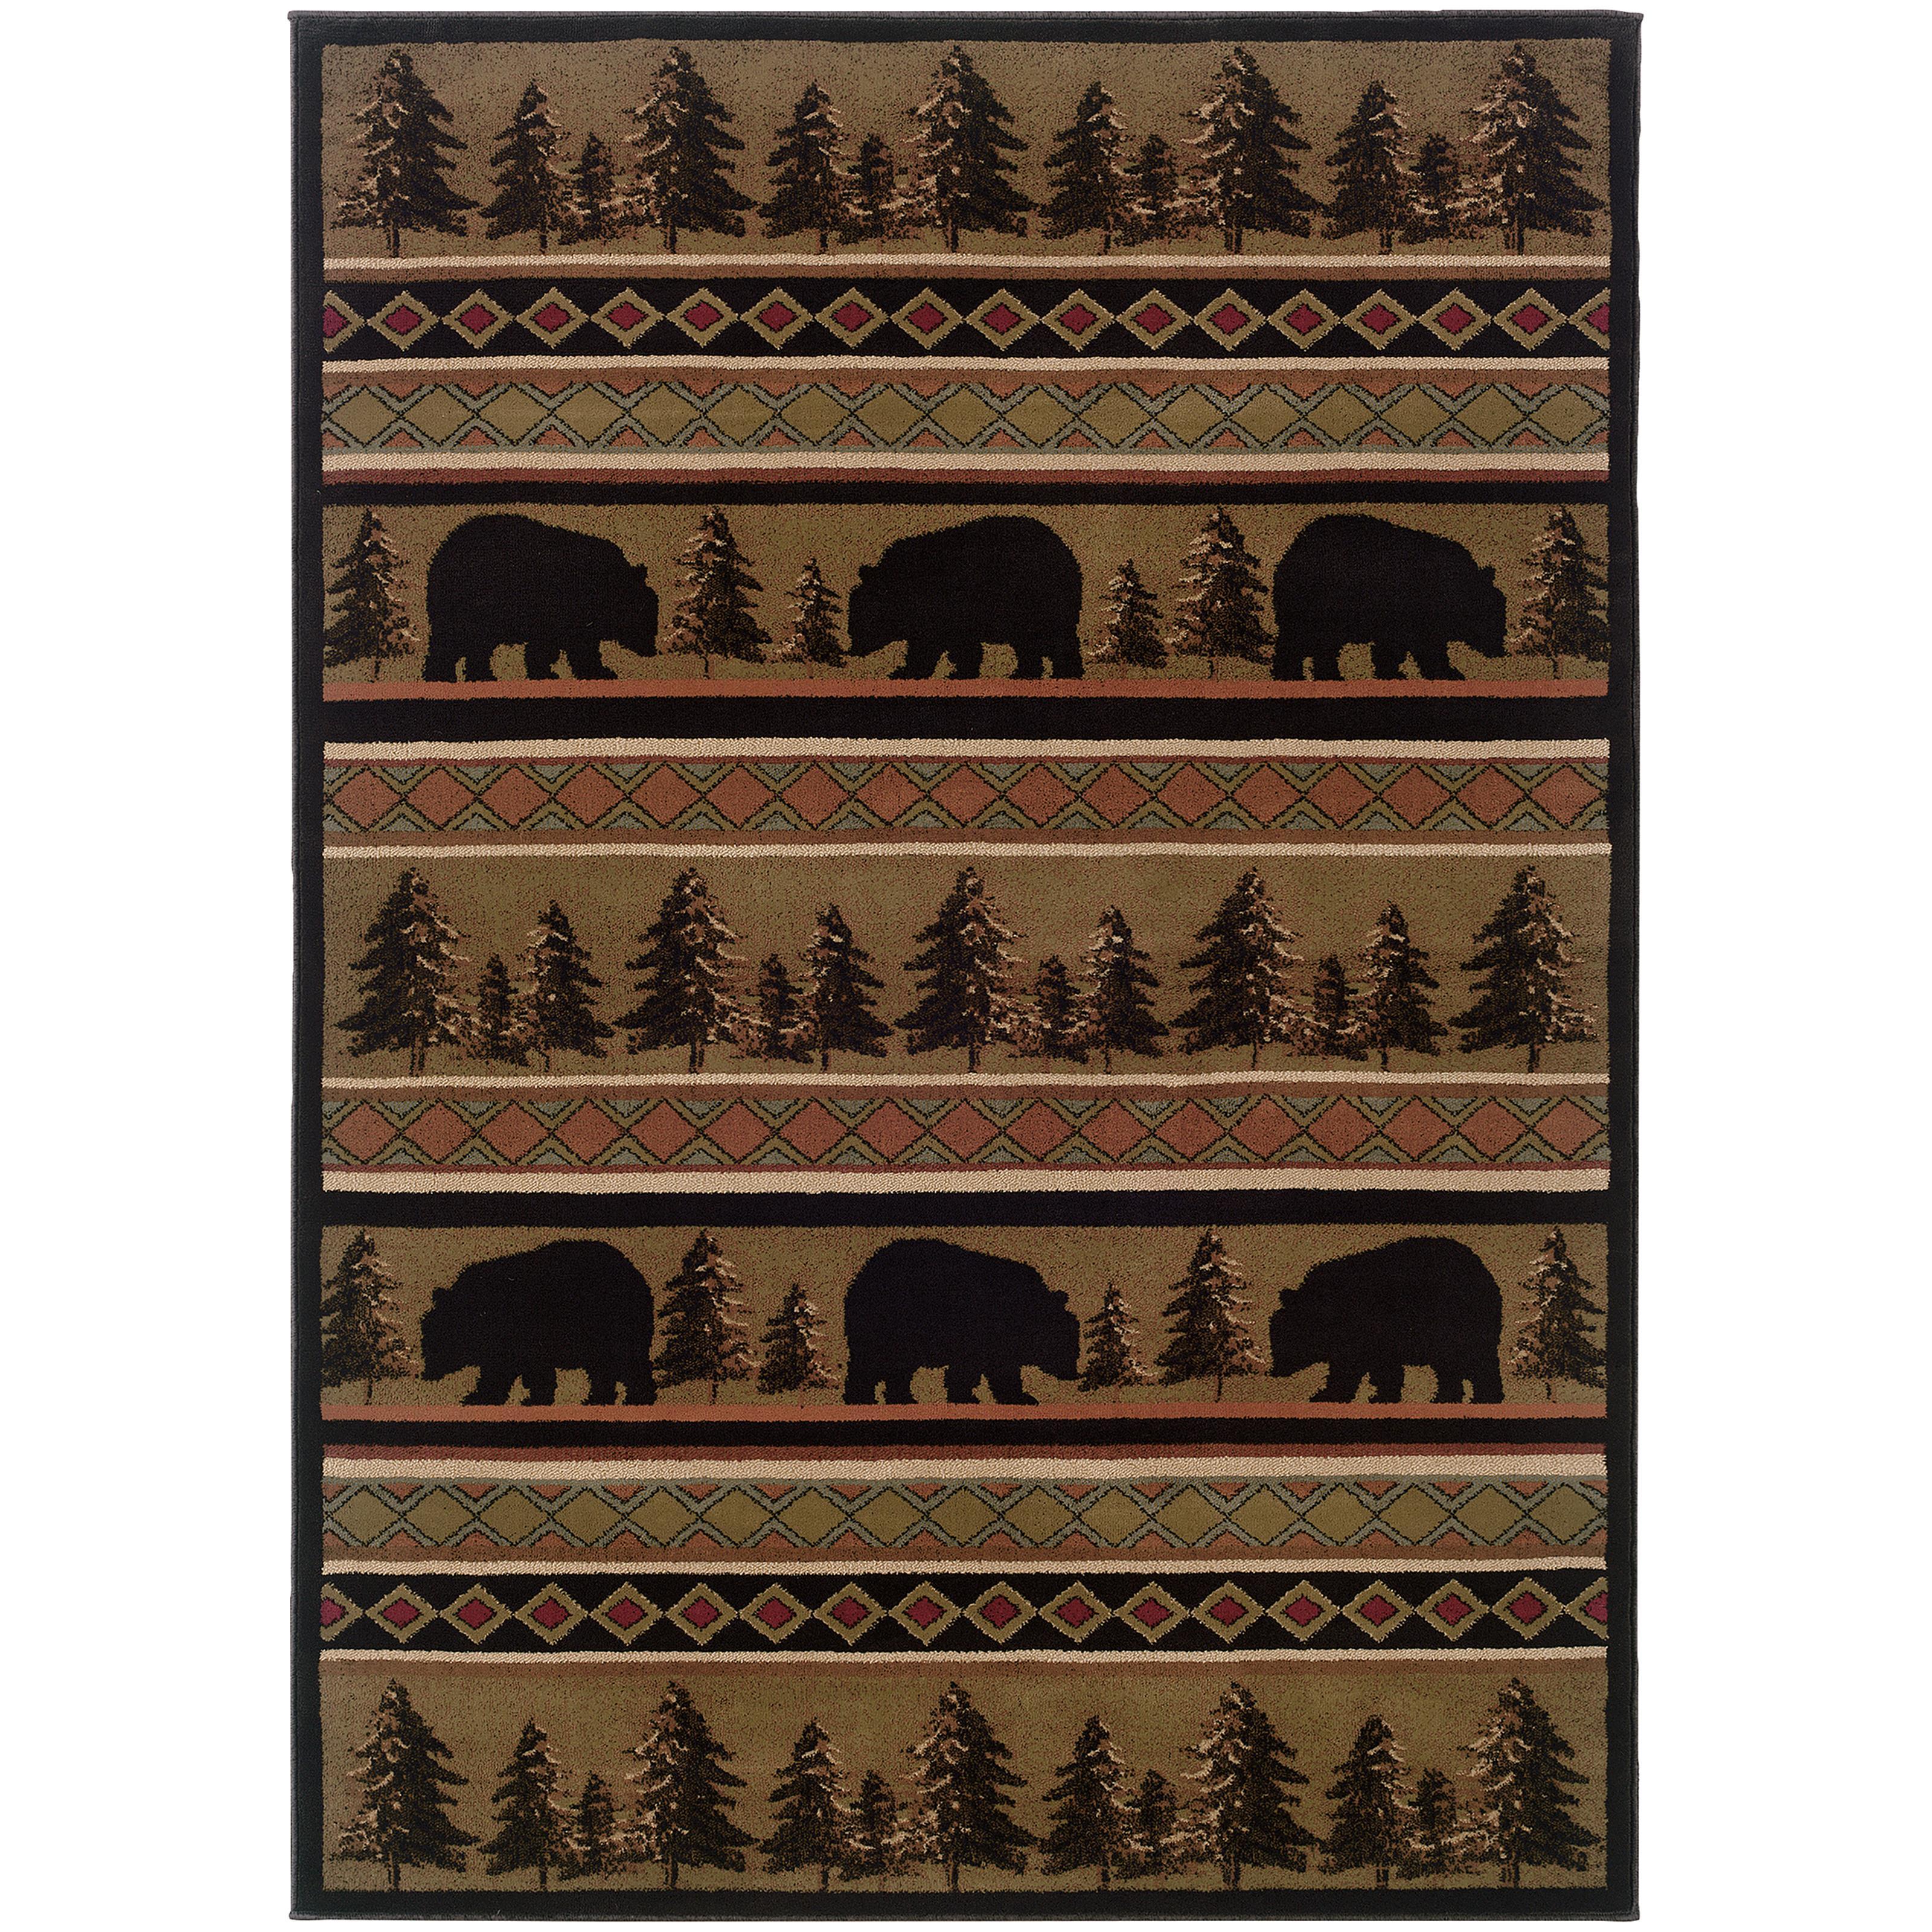 "Hudson 7' 8"" X 10'10"" Rug by Oriental Weavers at Novello Home Furnishings"